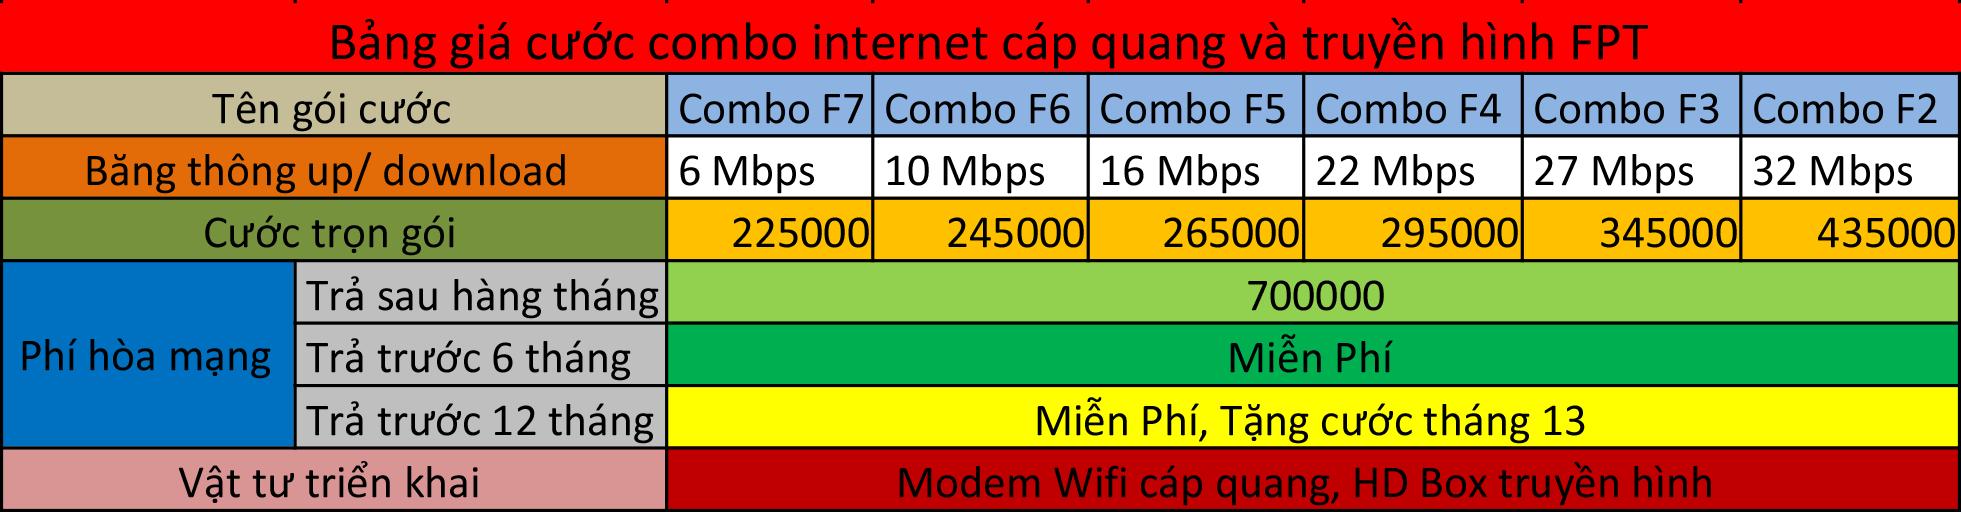 combo-cap-quang-fpt-thang-10